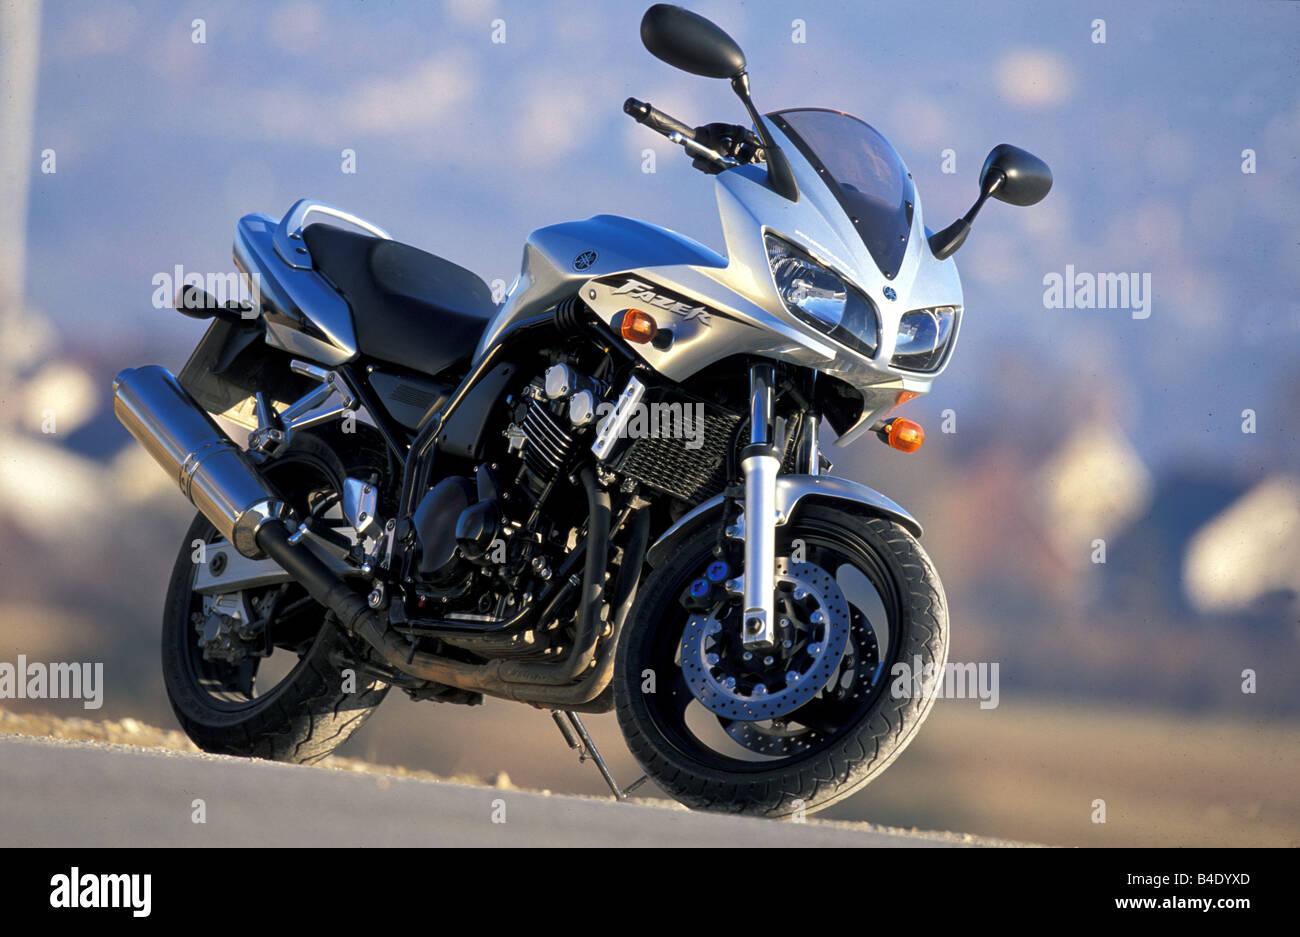 Engine cycle sports motor cycle sporttourer yamaha fzs 600 fazer silver